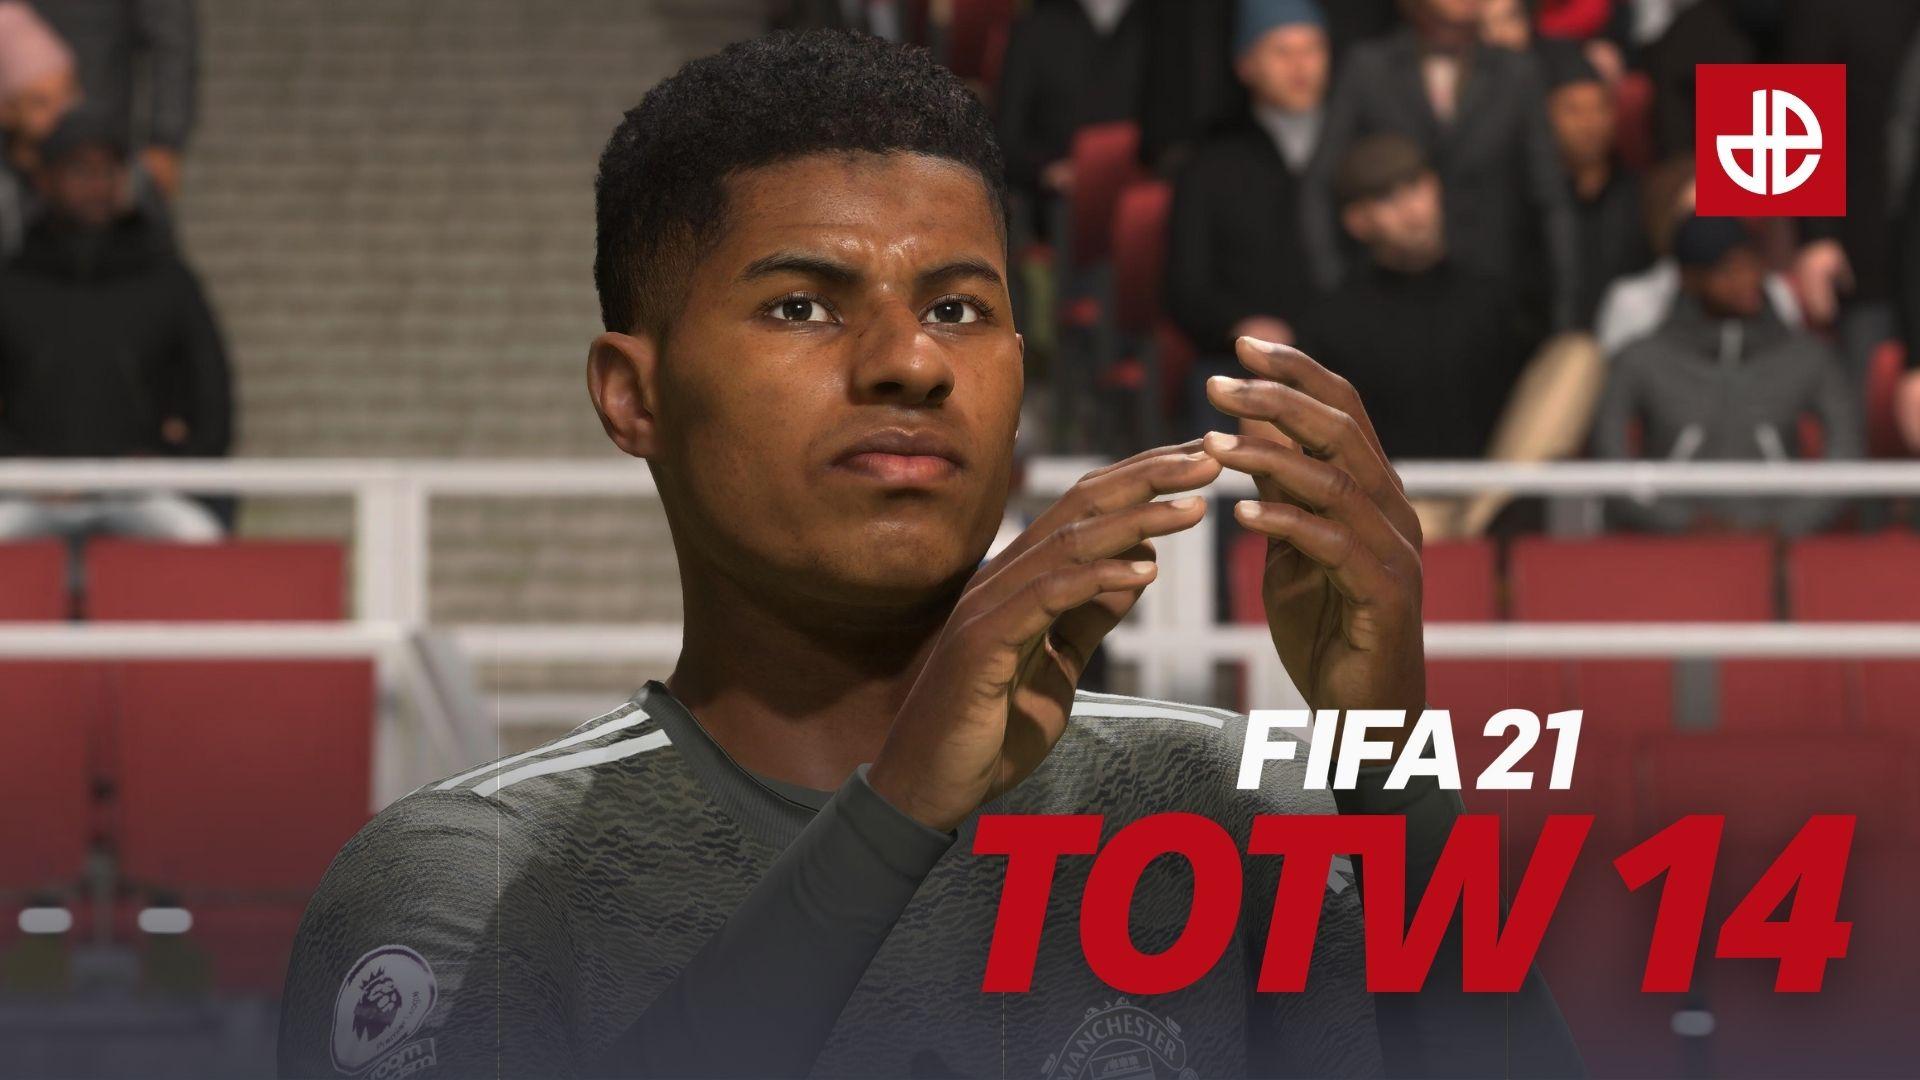 Marcus Rashford Manchester United FIFA 21 TOTW 14.